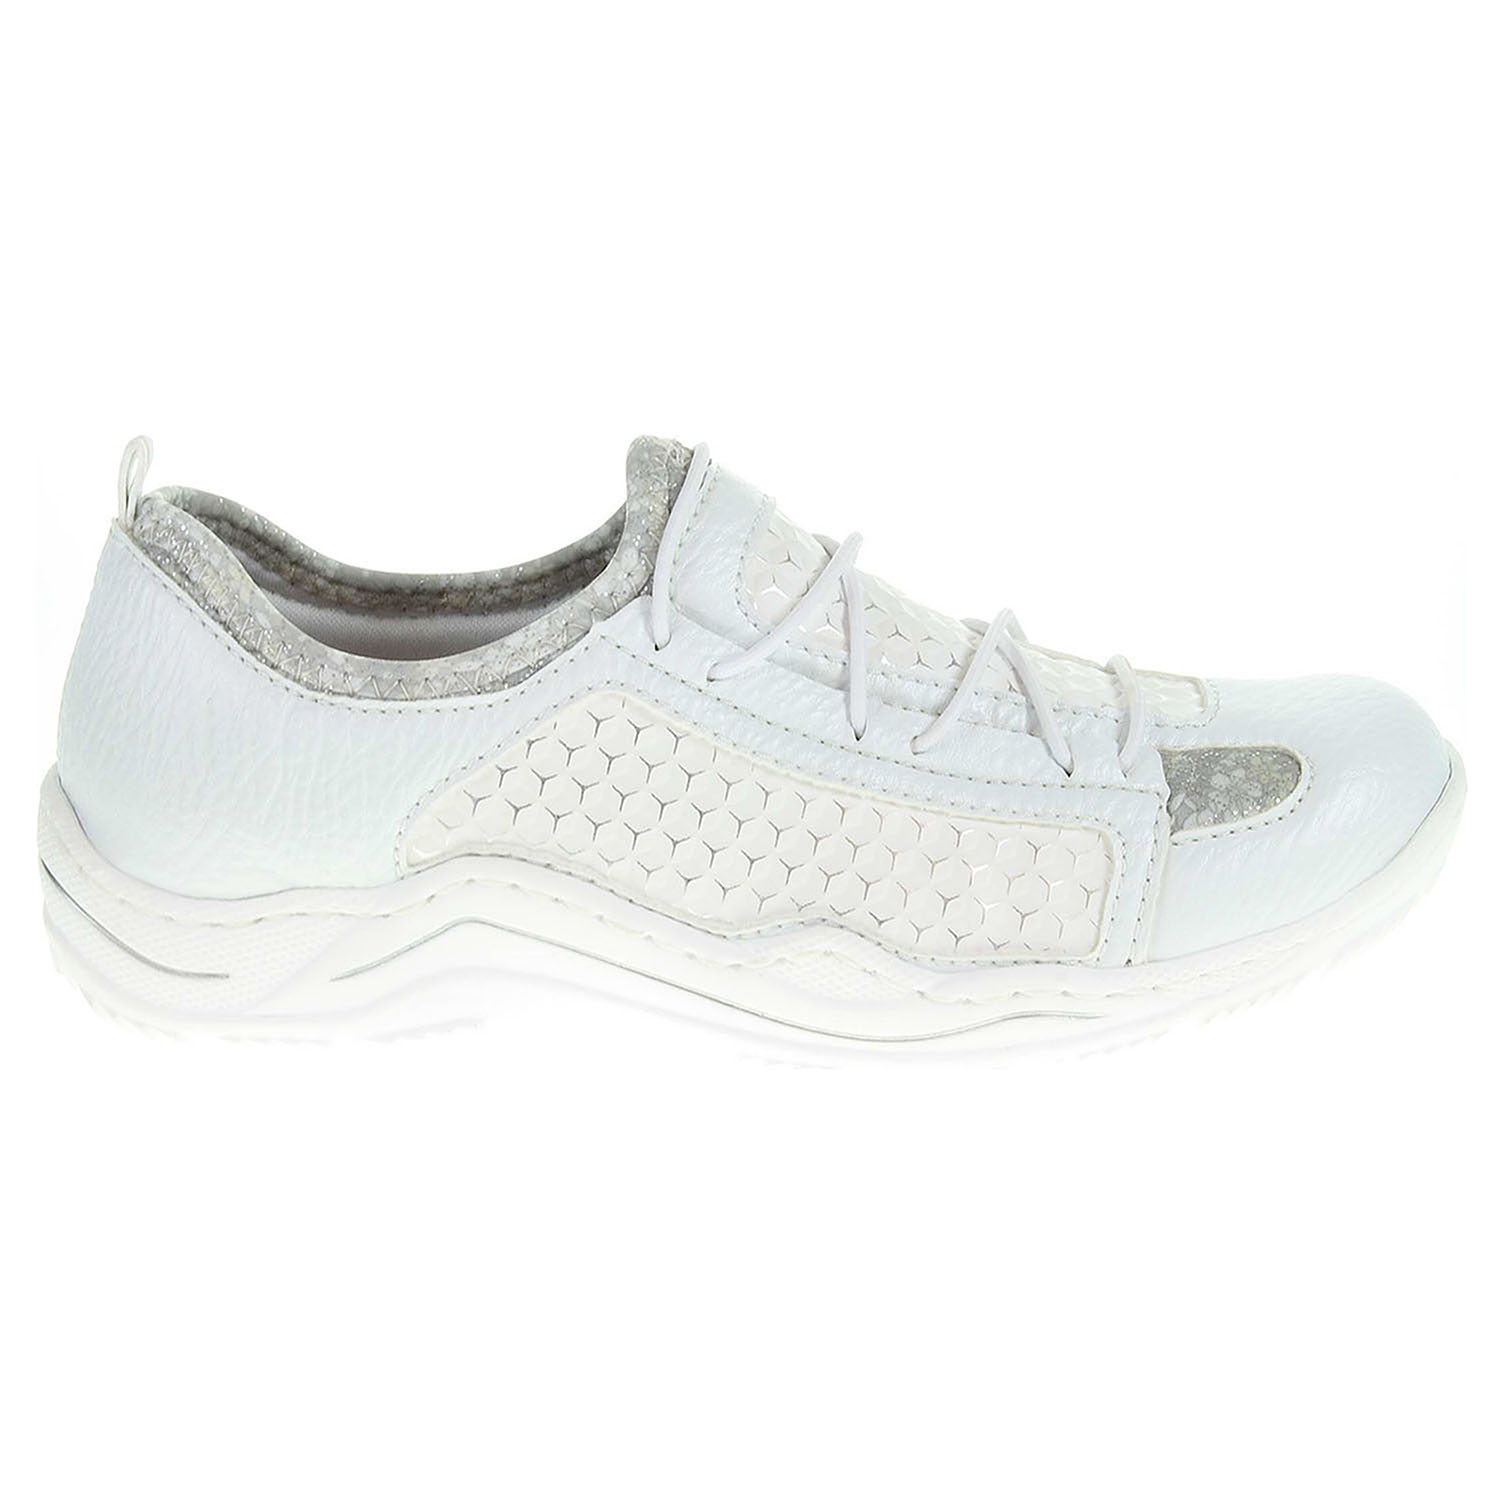 Ecco Rieker dámská obuv L0580-81 weiss kombi 23200766 e97117d543b